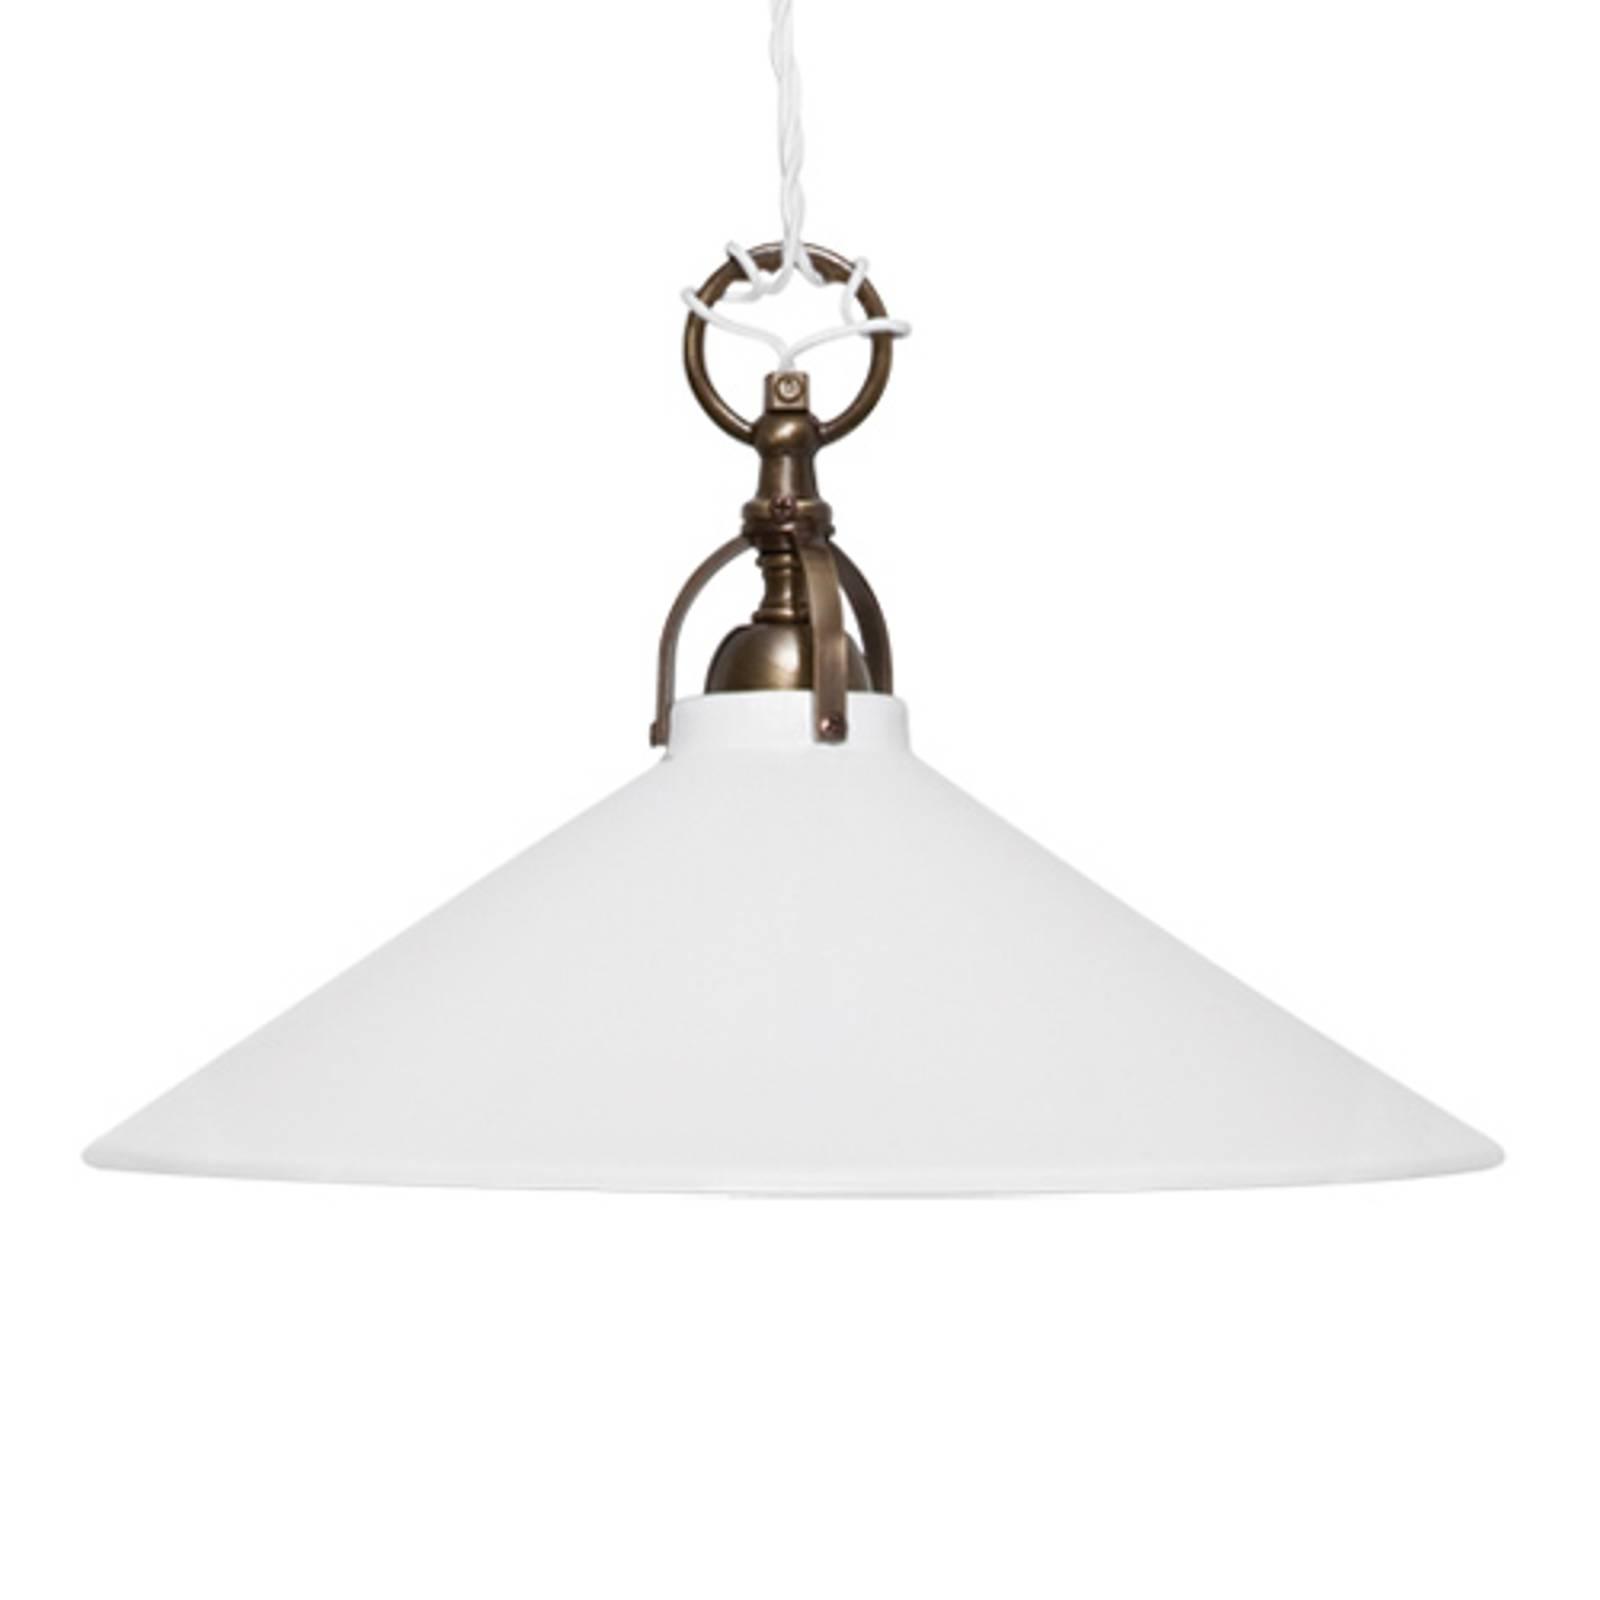 Aparte hanglamp Ike